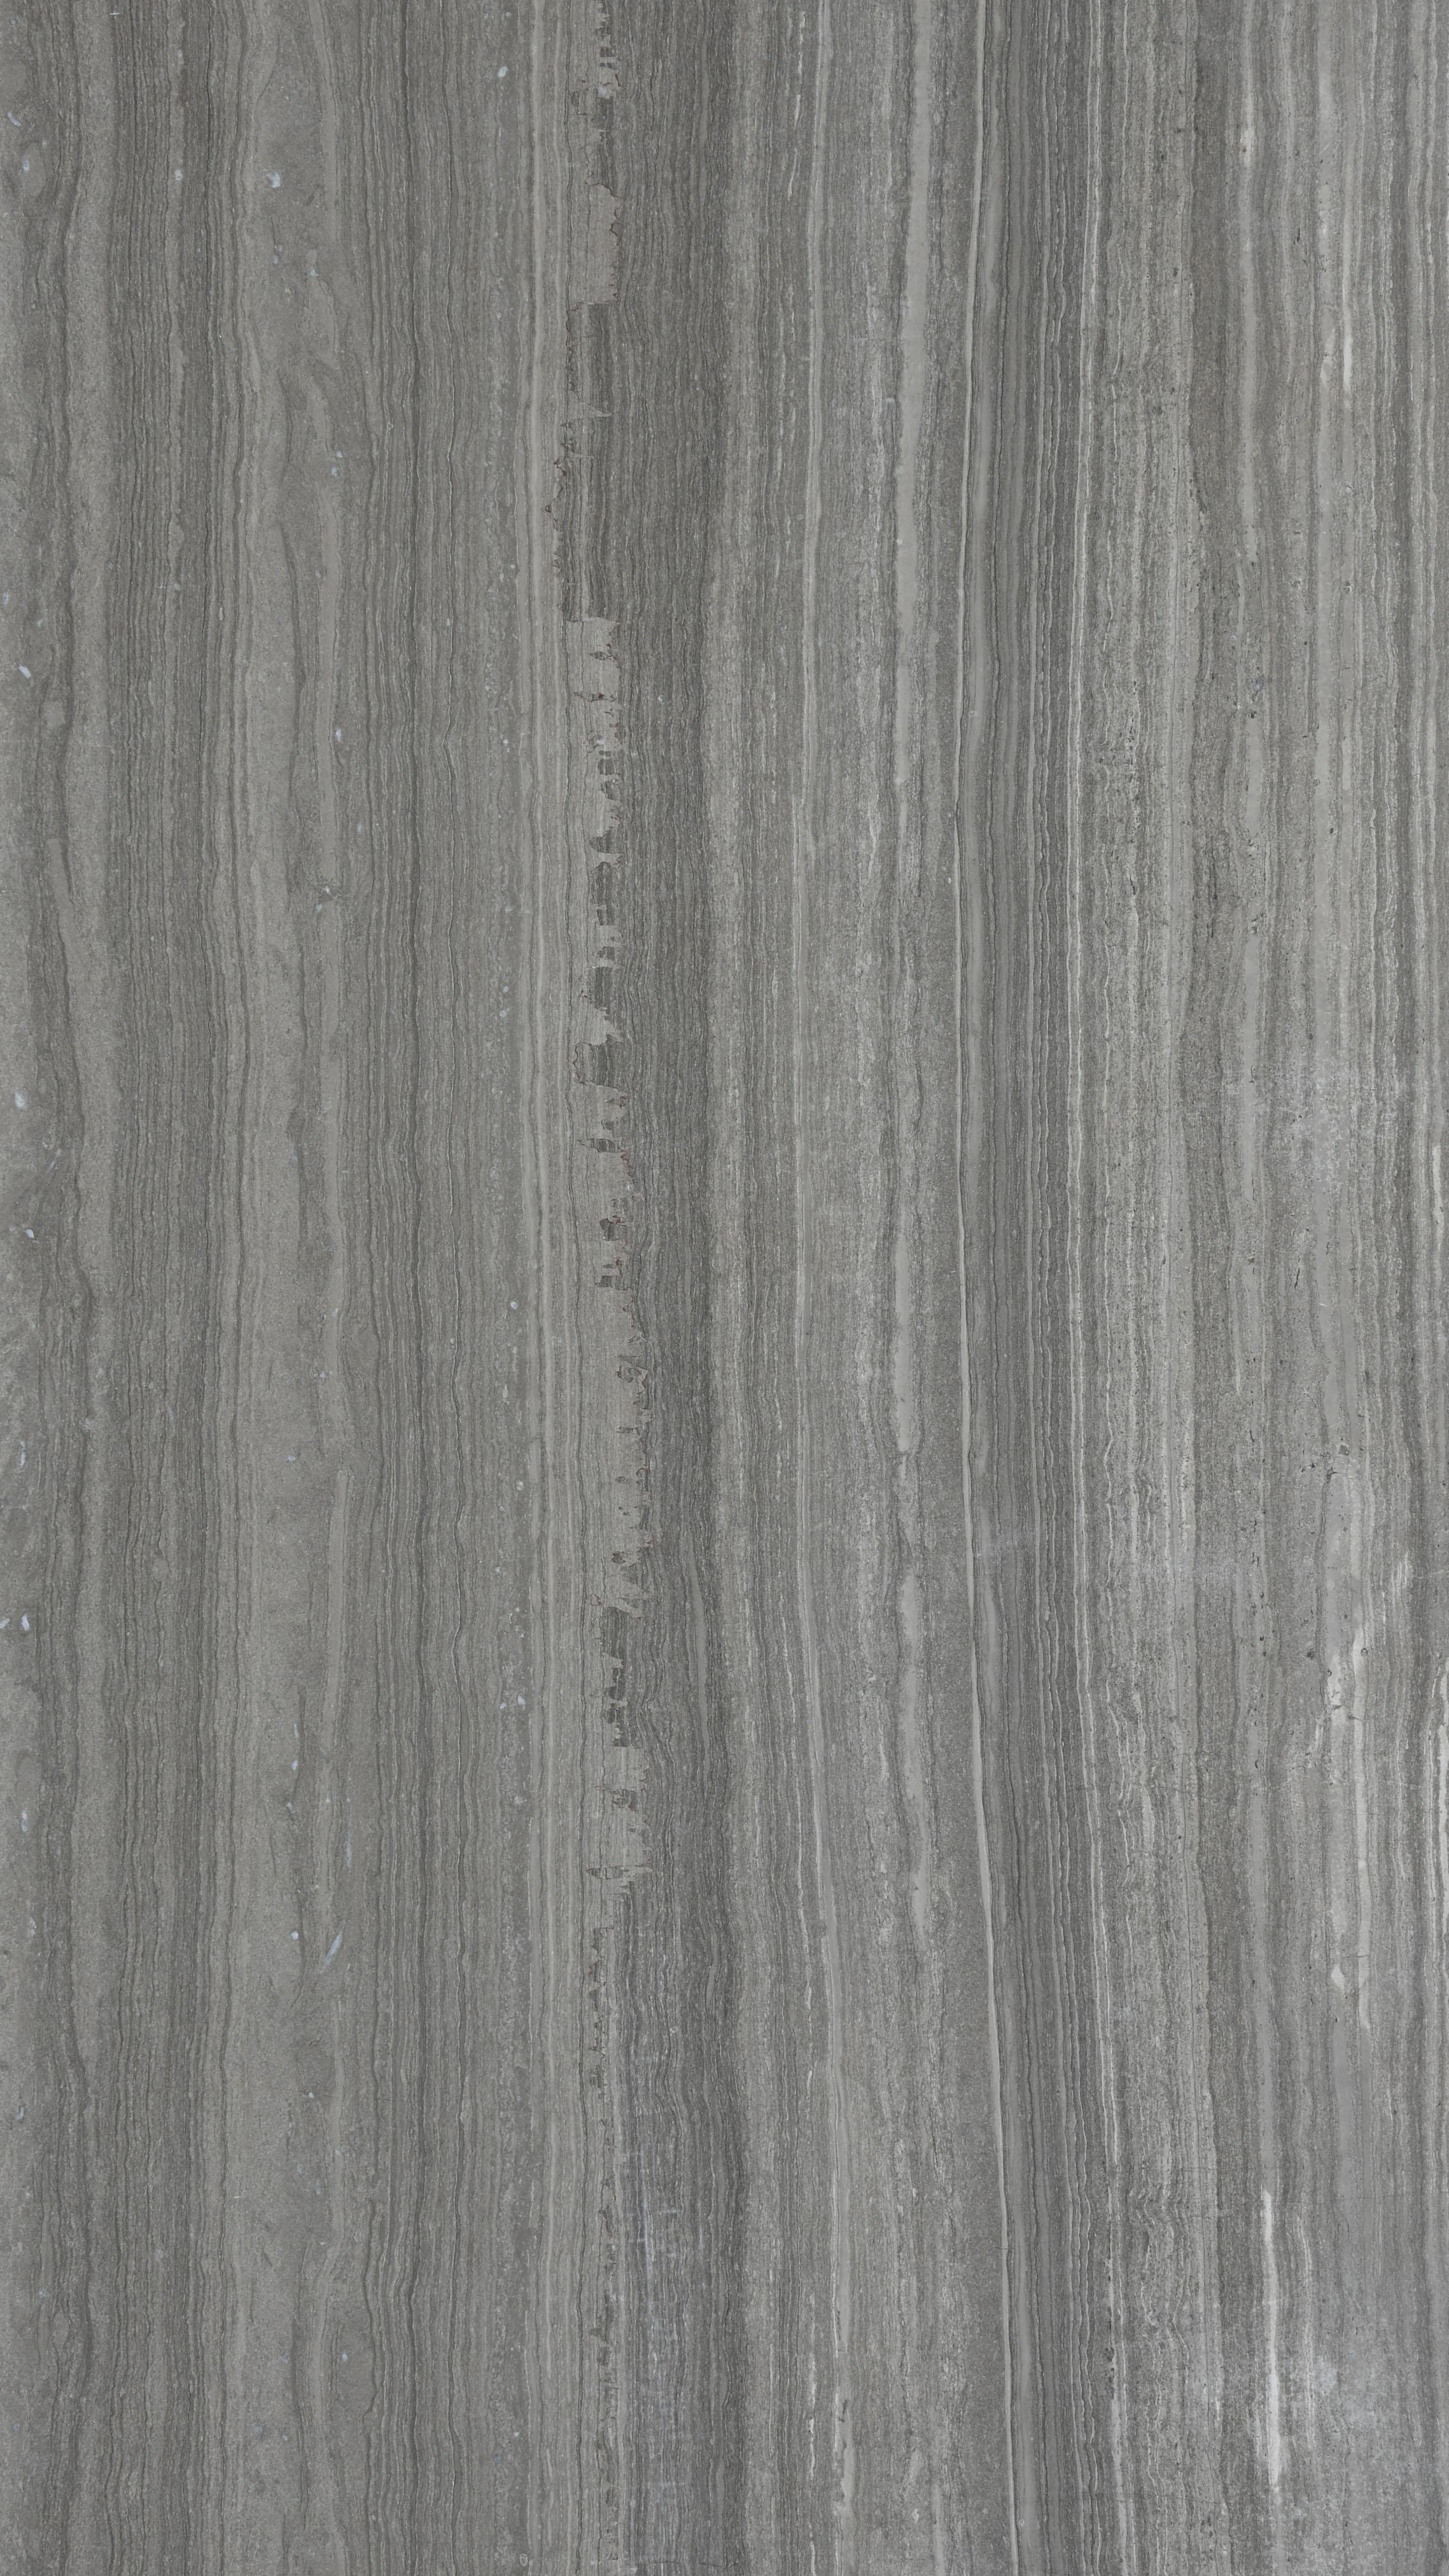 Coffee Wood Marble